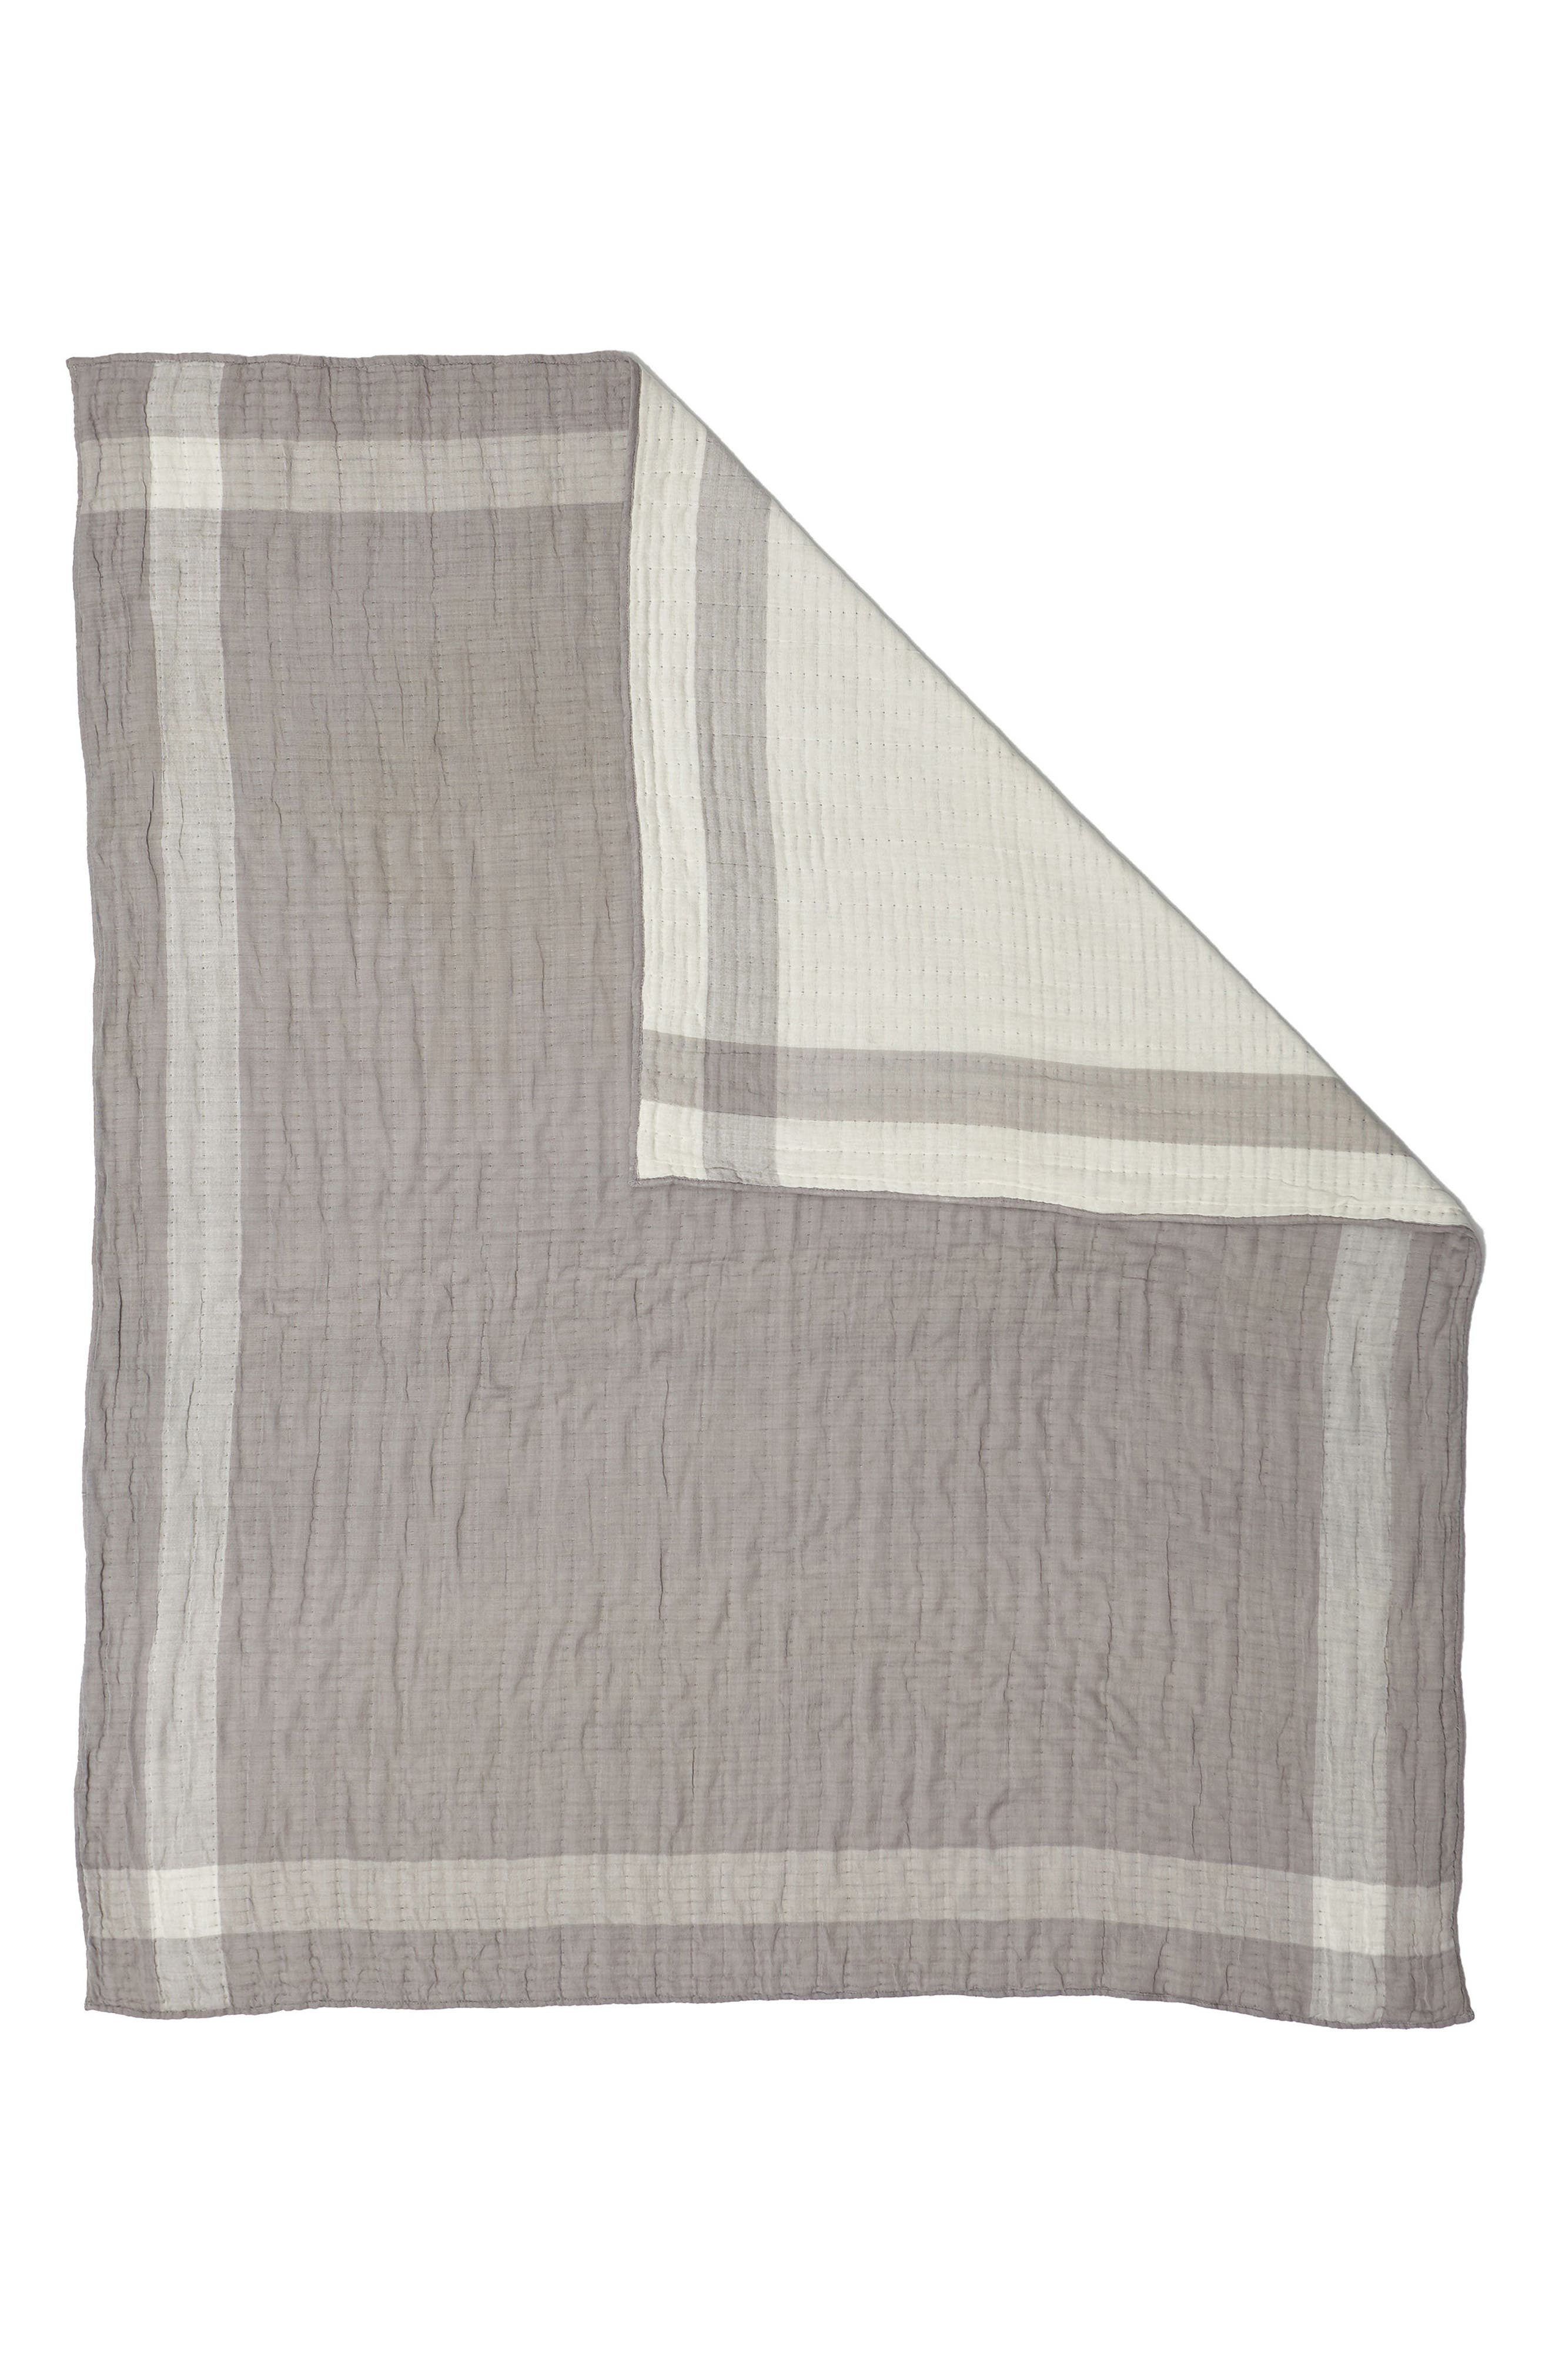 Sidekick Blanket,                         Main,                         color, 020